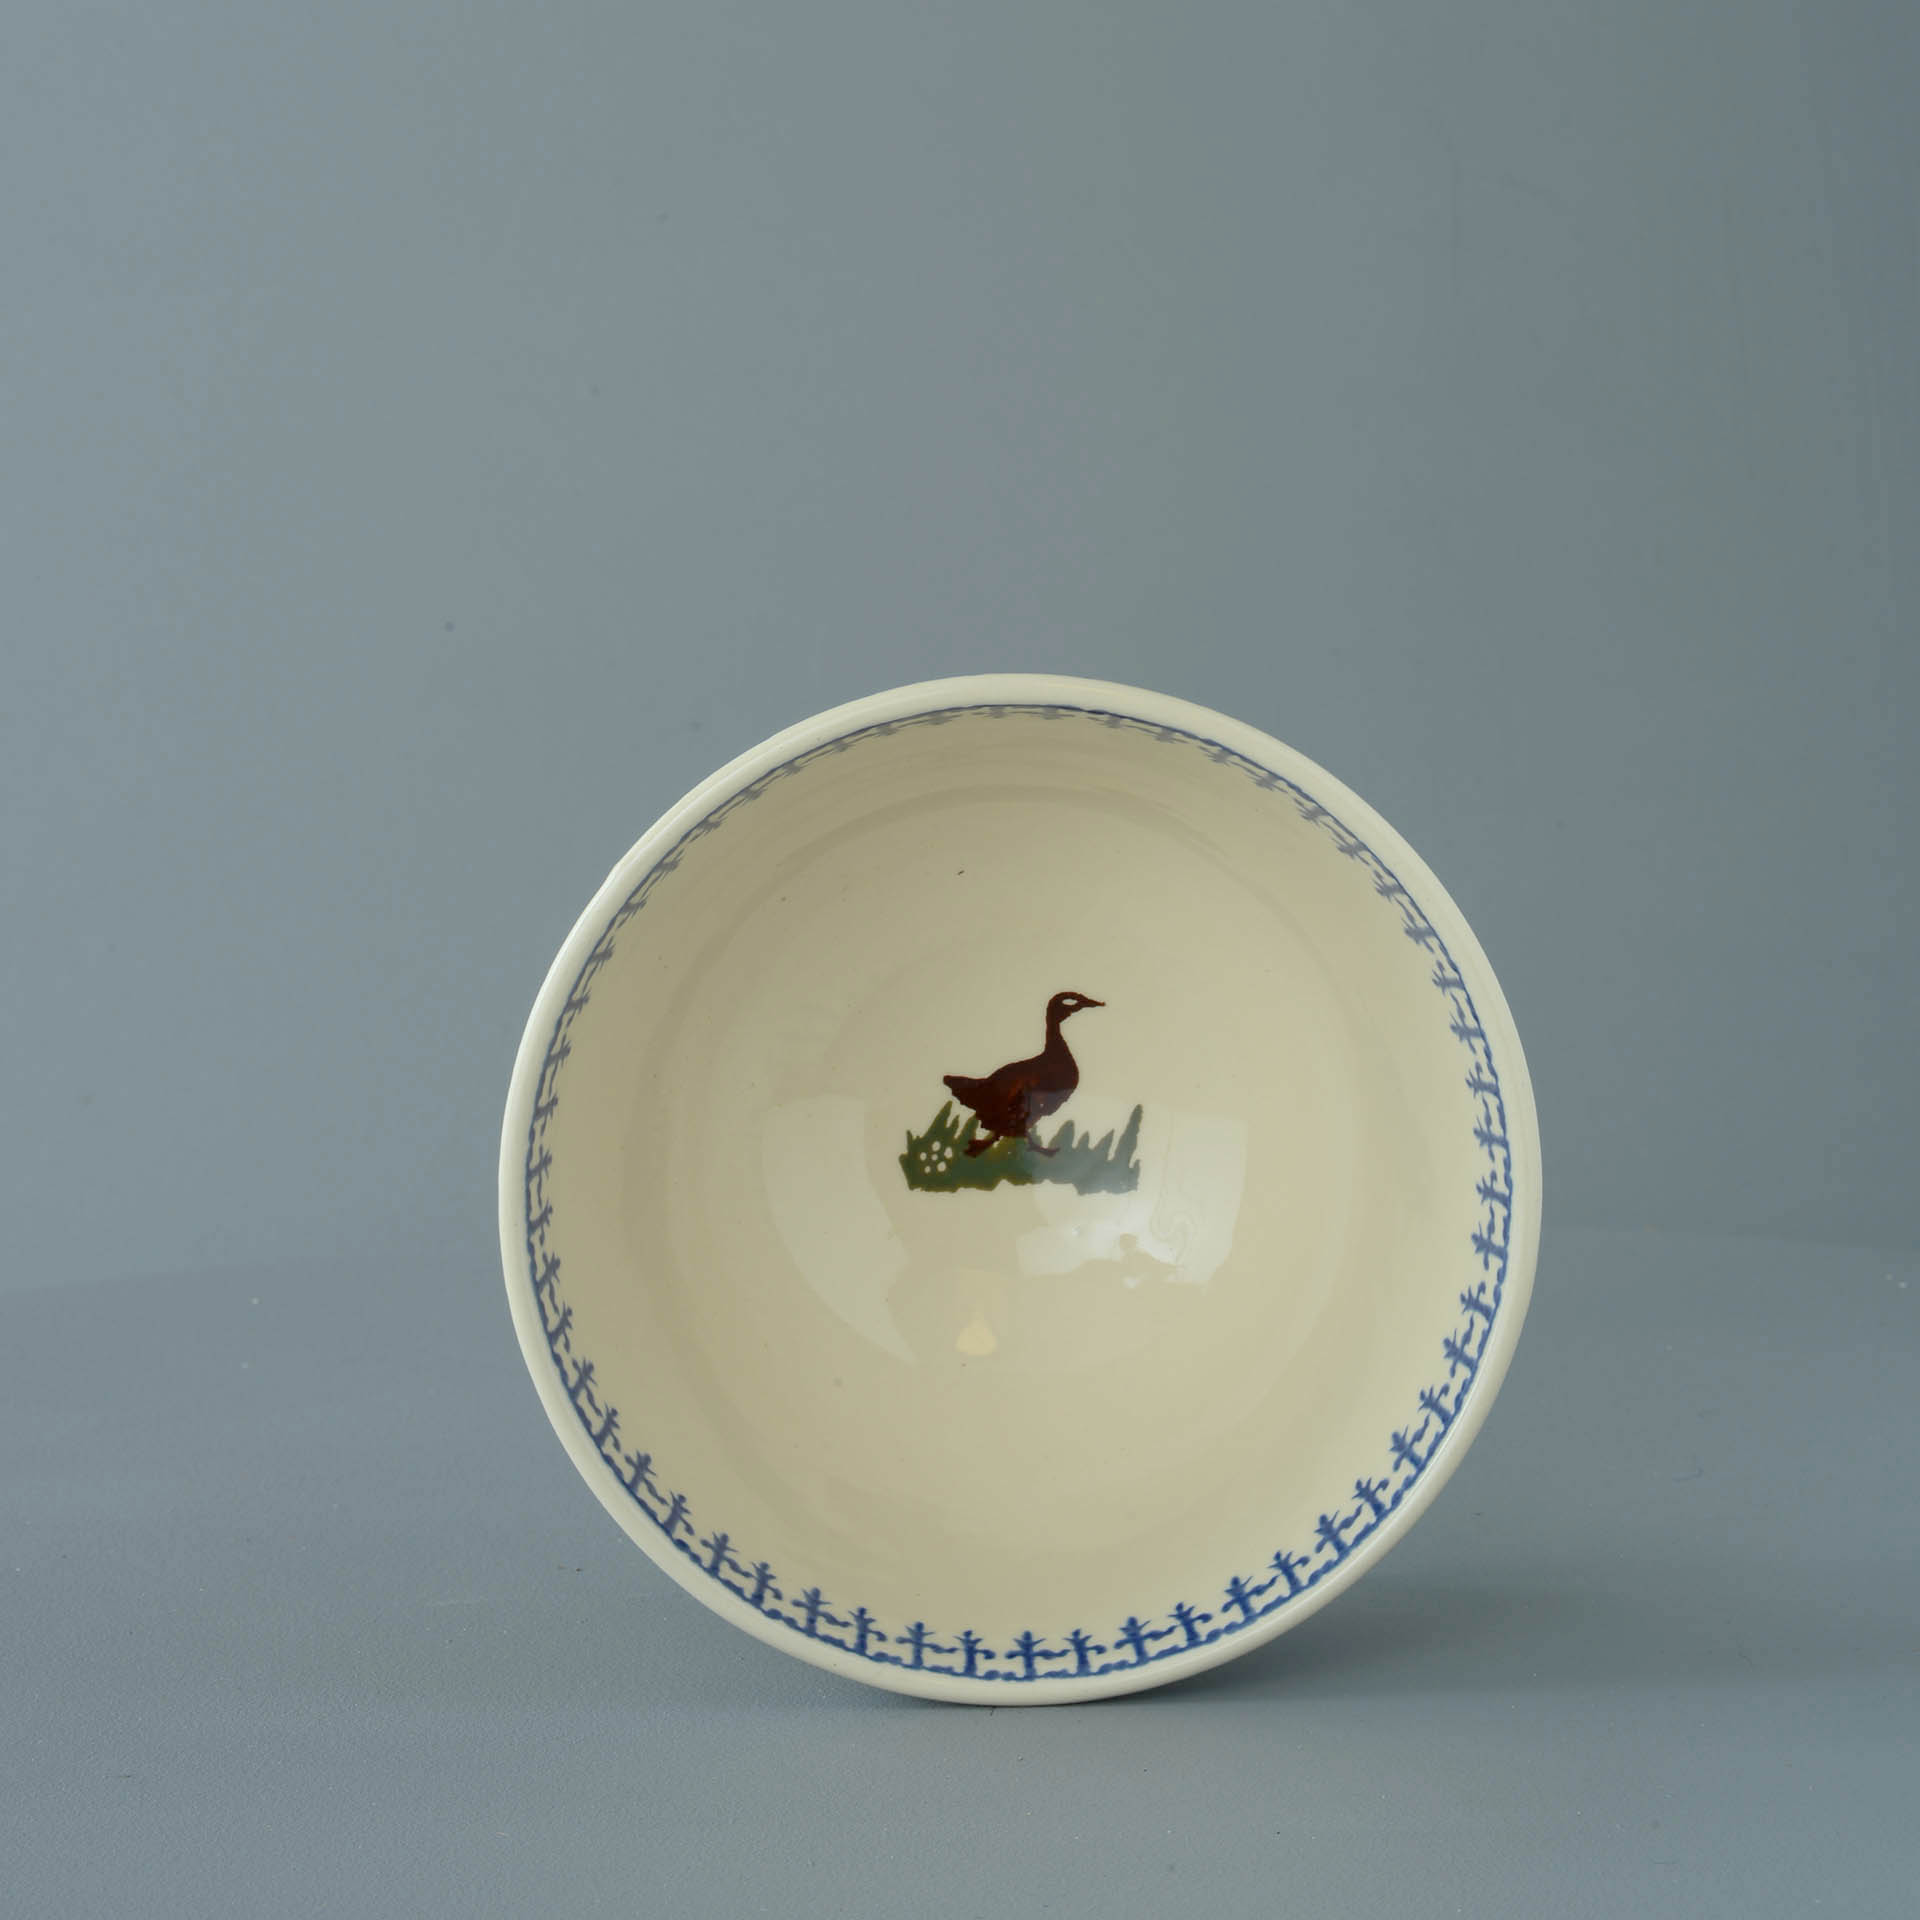 Farm Animals Soup Bowl 9 x 15.5cm